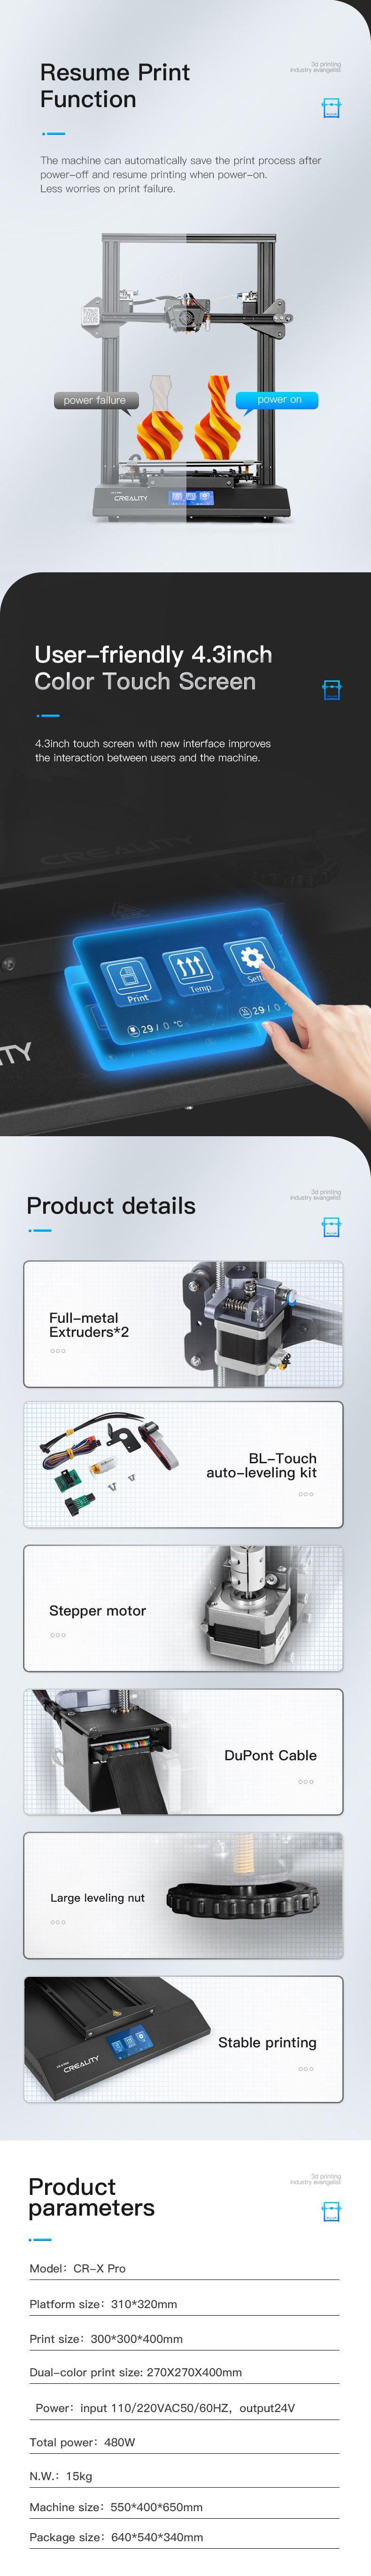 creality cr-x pro 3d printer